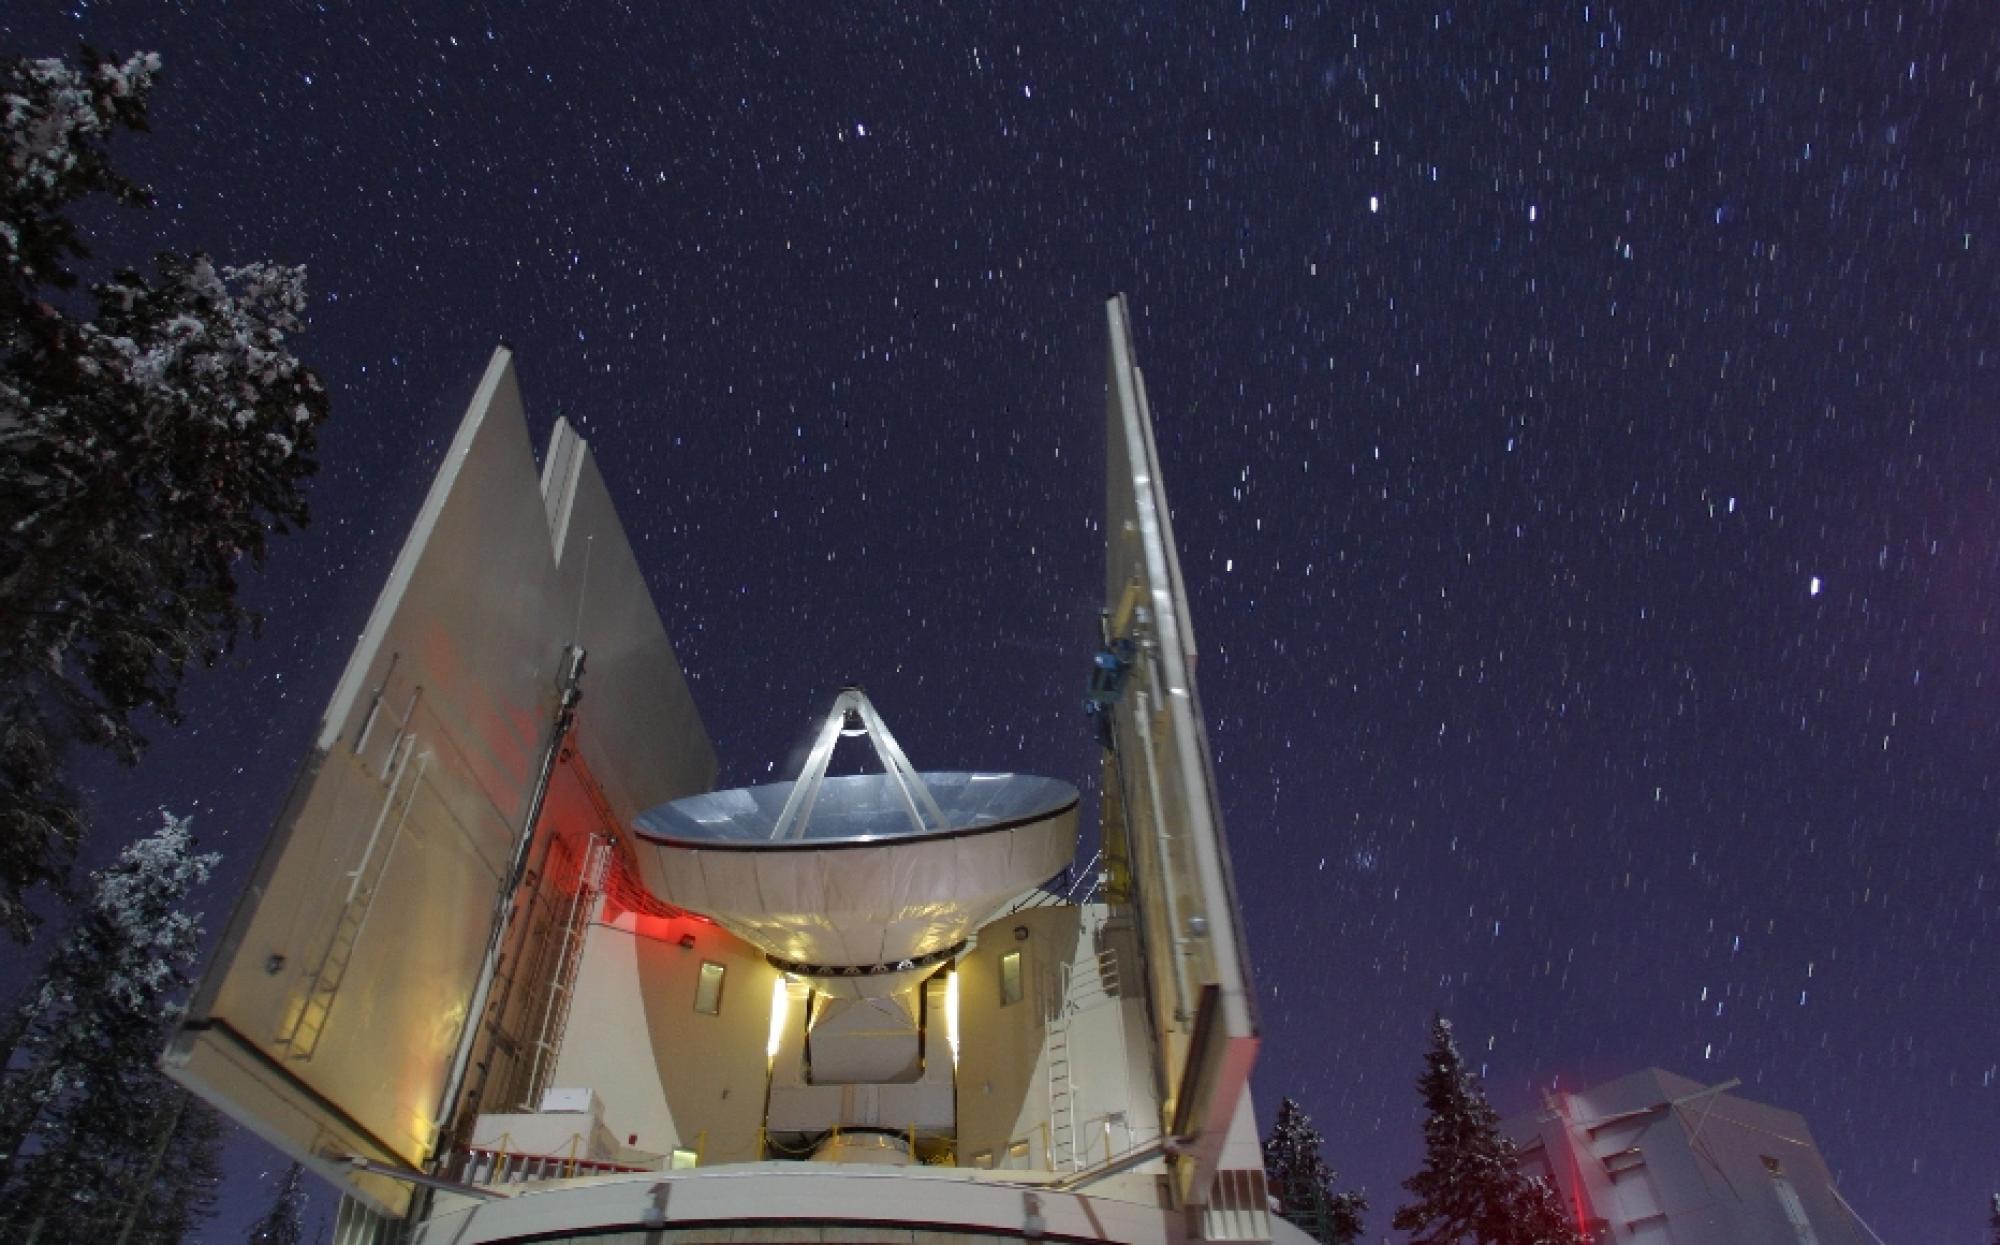 The 10-meter dish Arizona Radio Observatory's Submillimeter Telescope, or SMT, at Mount Graham, Ariz.